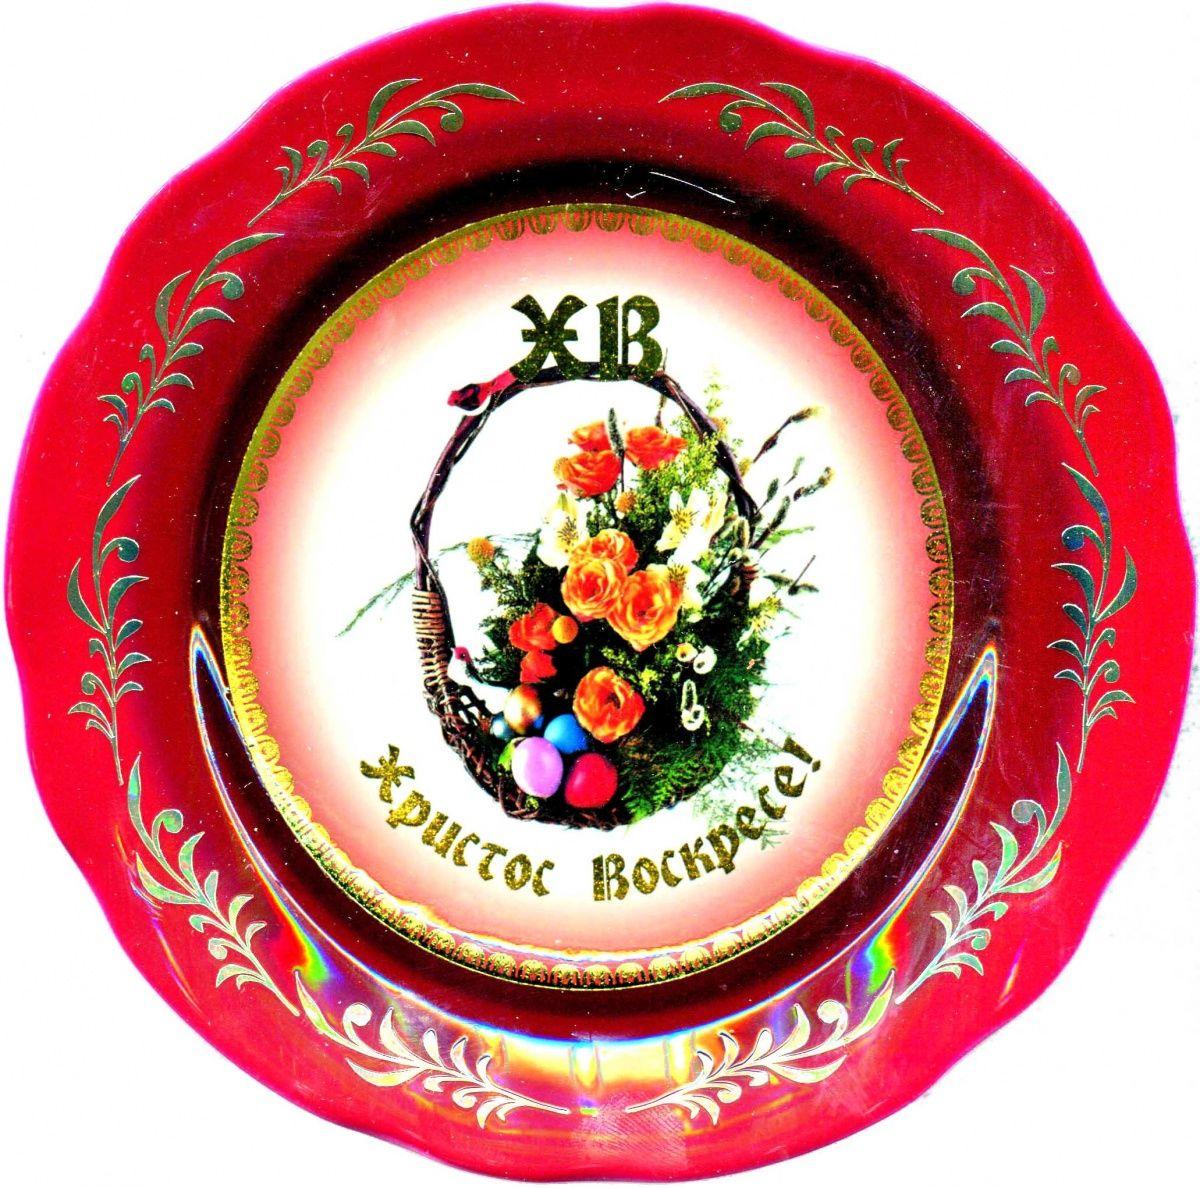 "Dulevo porcelain / Decorative plate ""Christ is Risen!"""